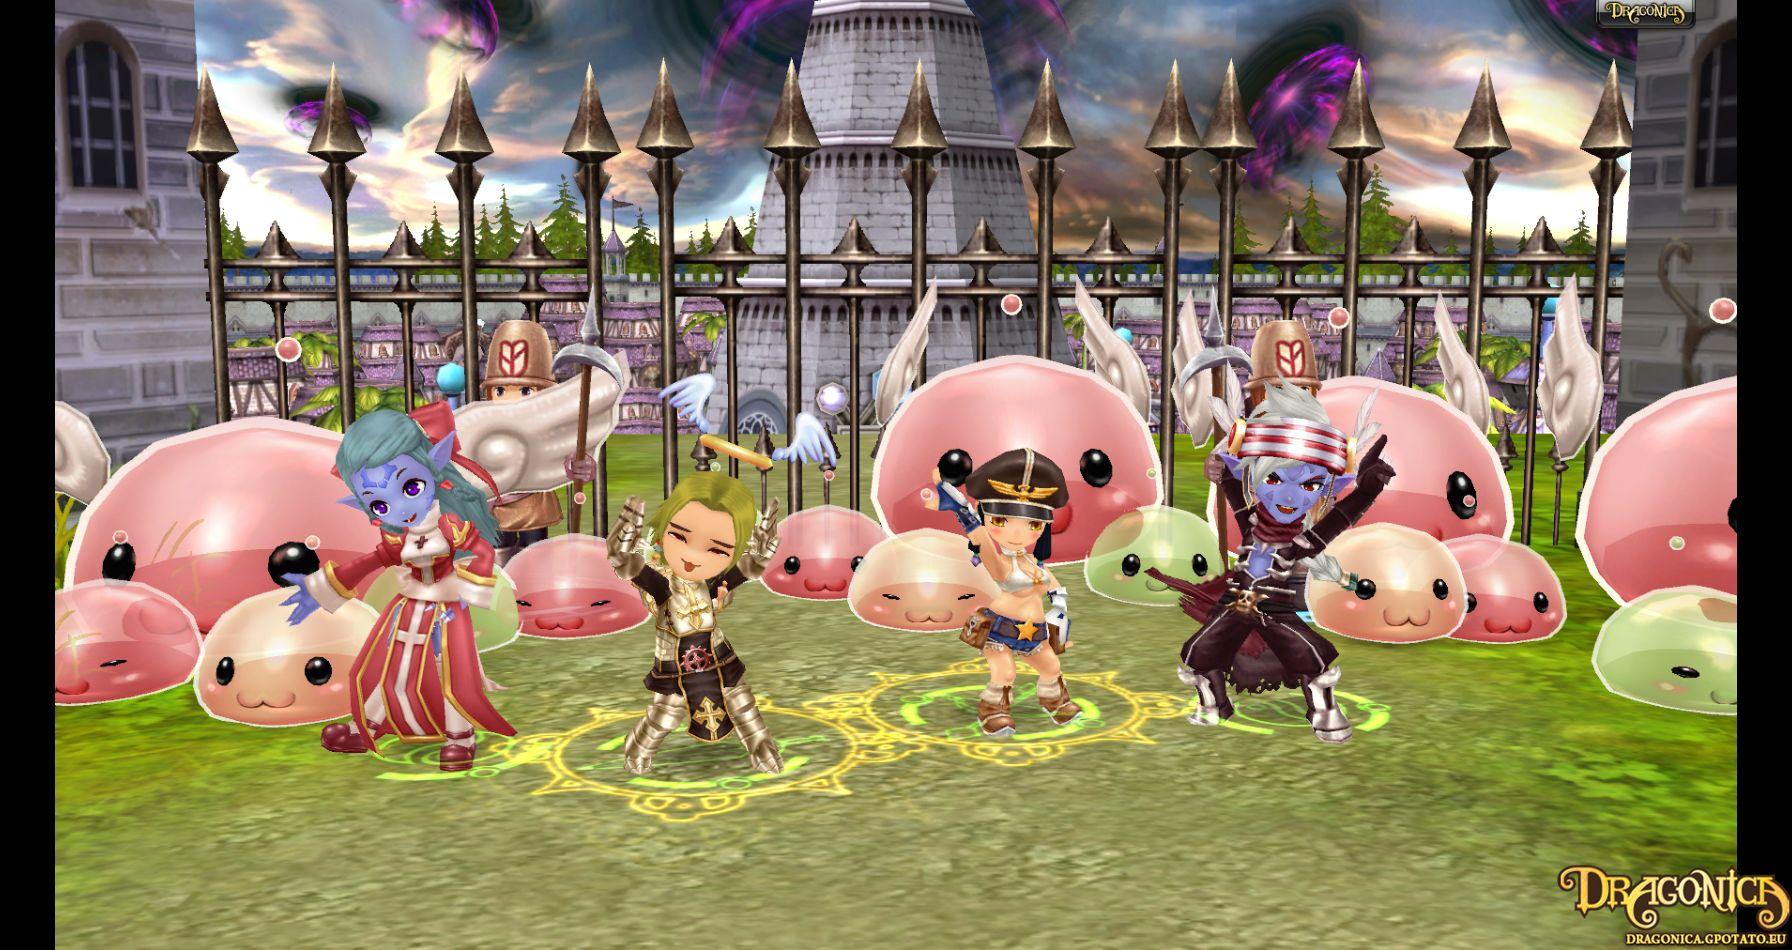 Dragonica Browsergame Fantasy